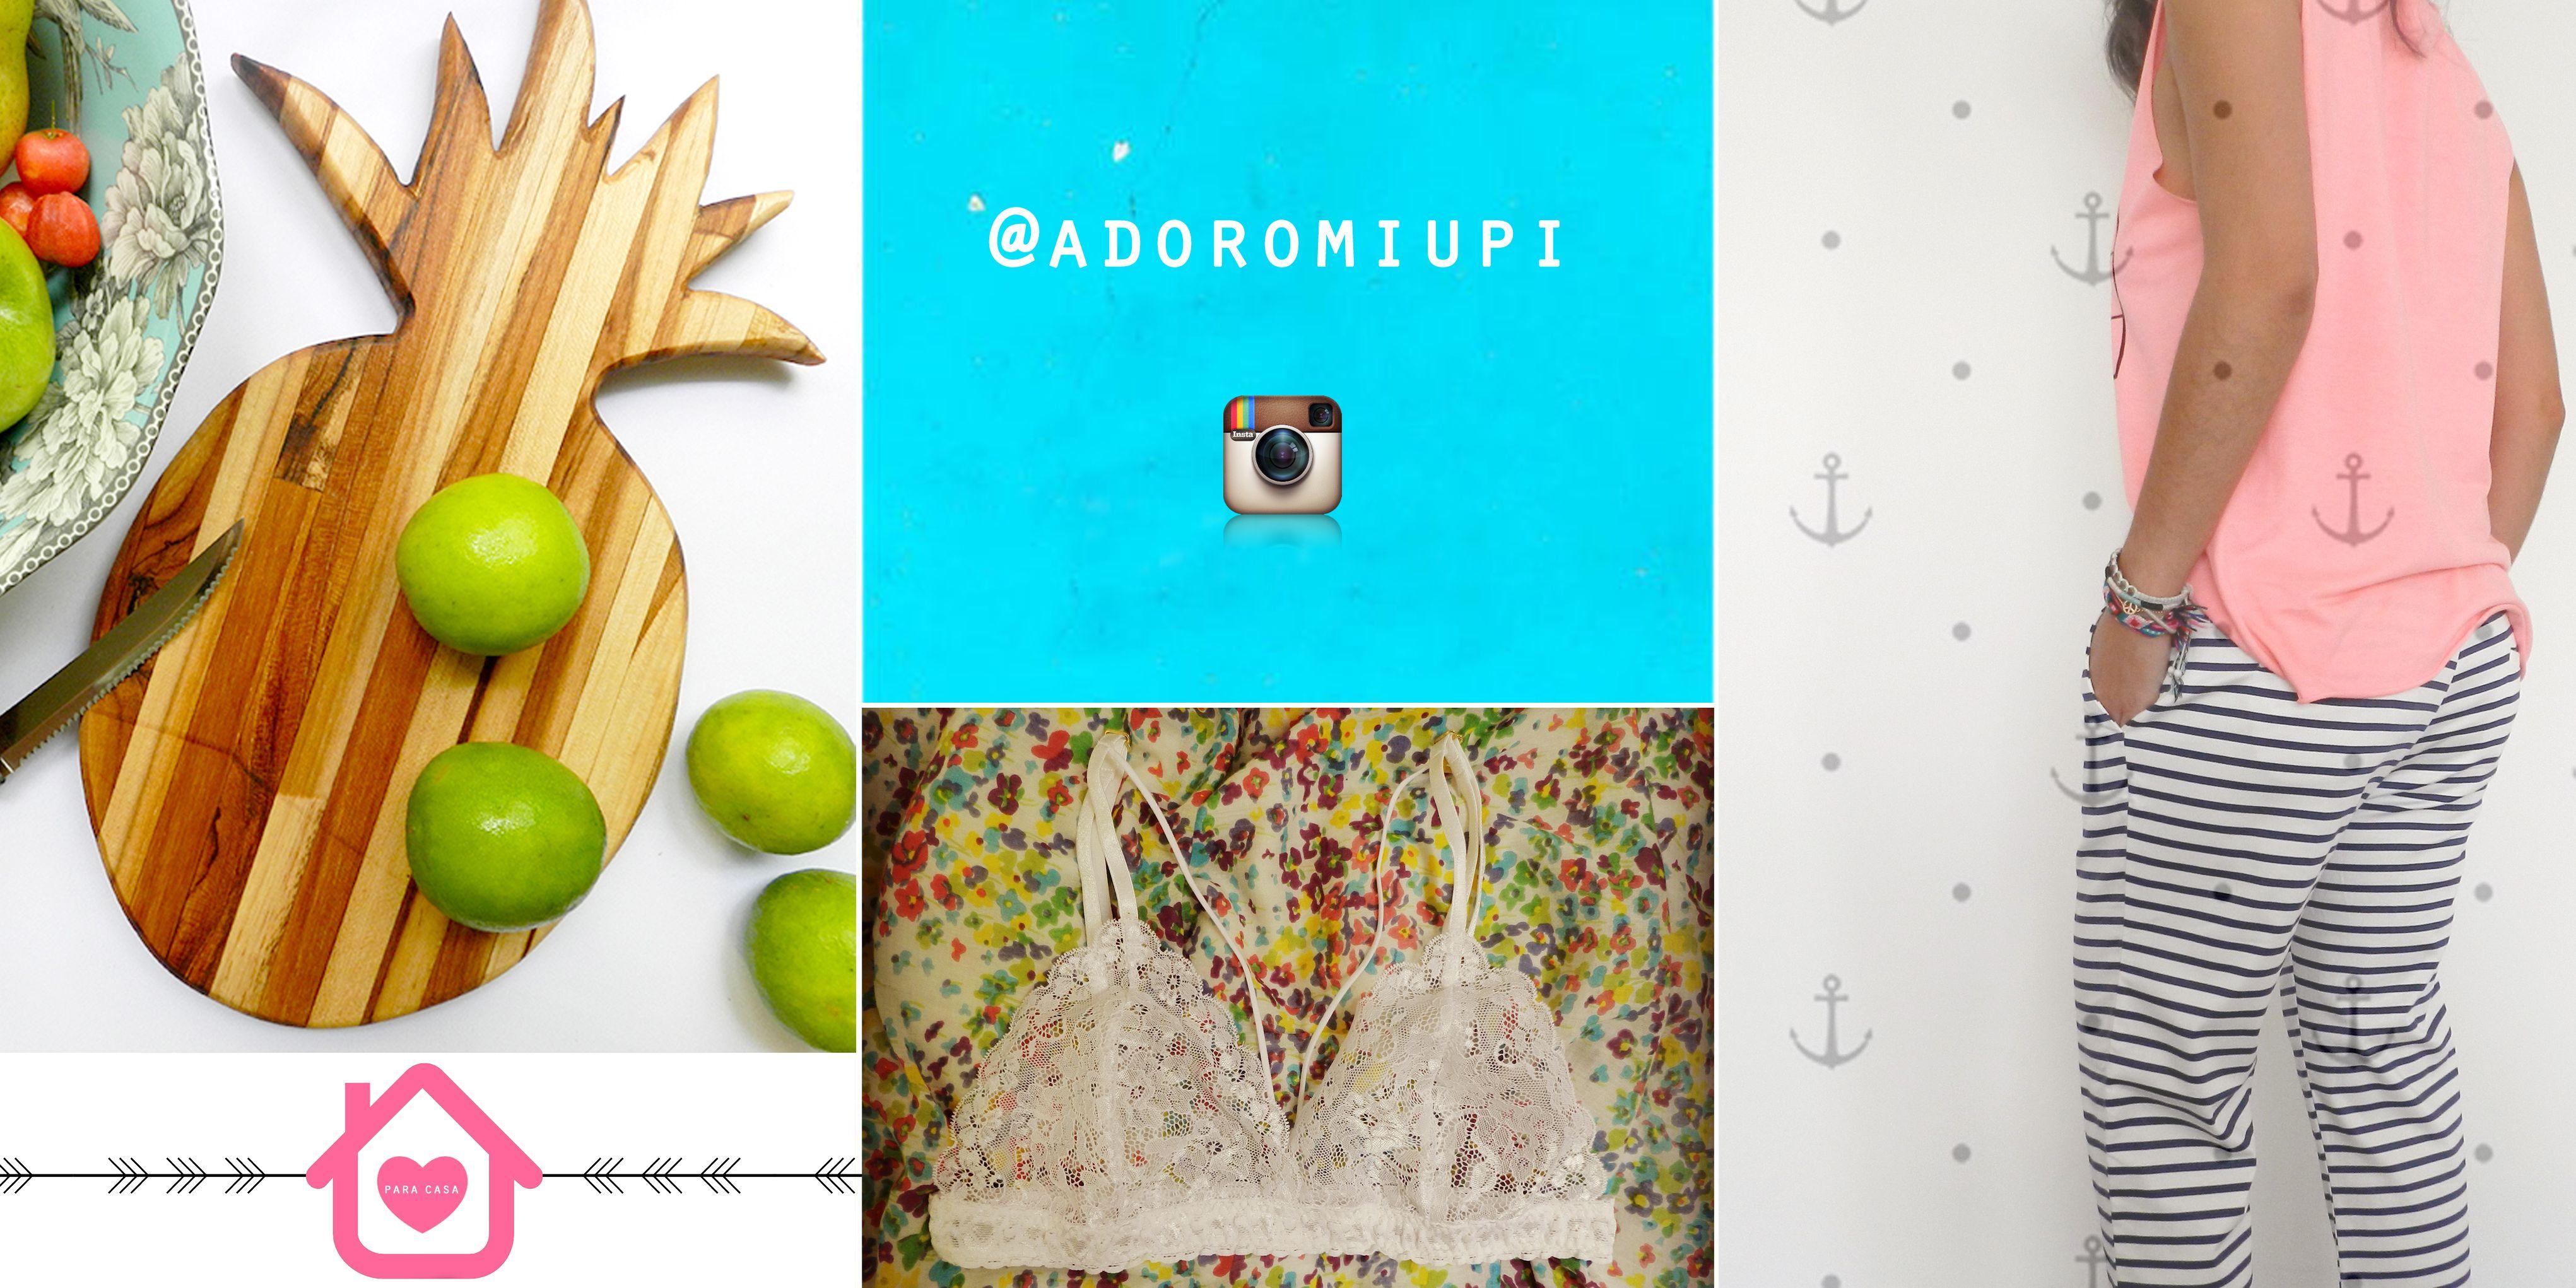 #miupi #adoromiupi #instagram #instacool #instmood #seguir #follow #picoftheday #achadosdasemana #vem